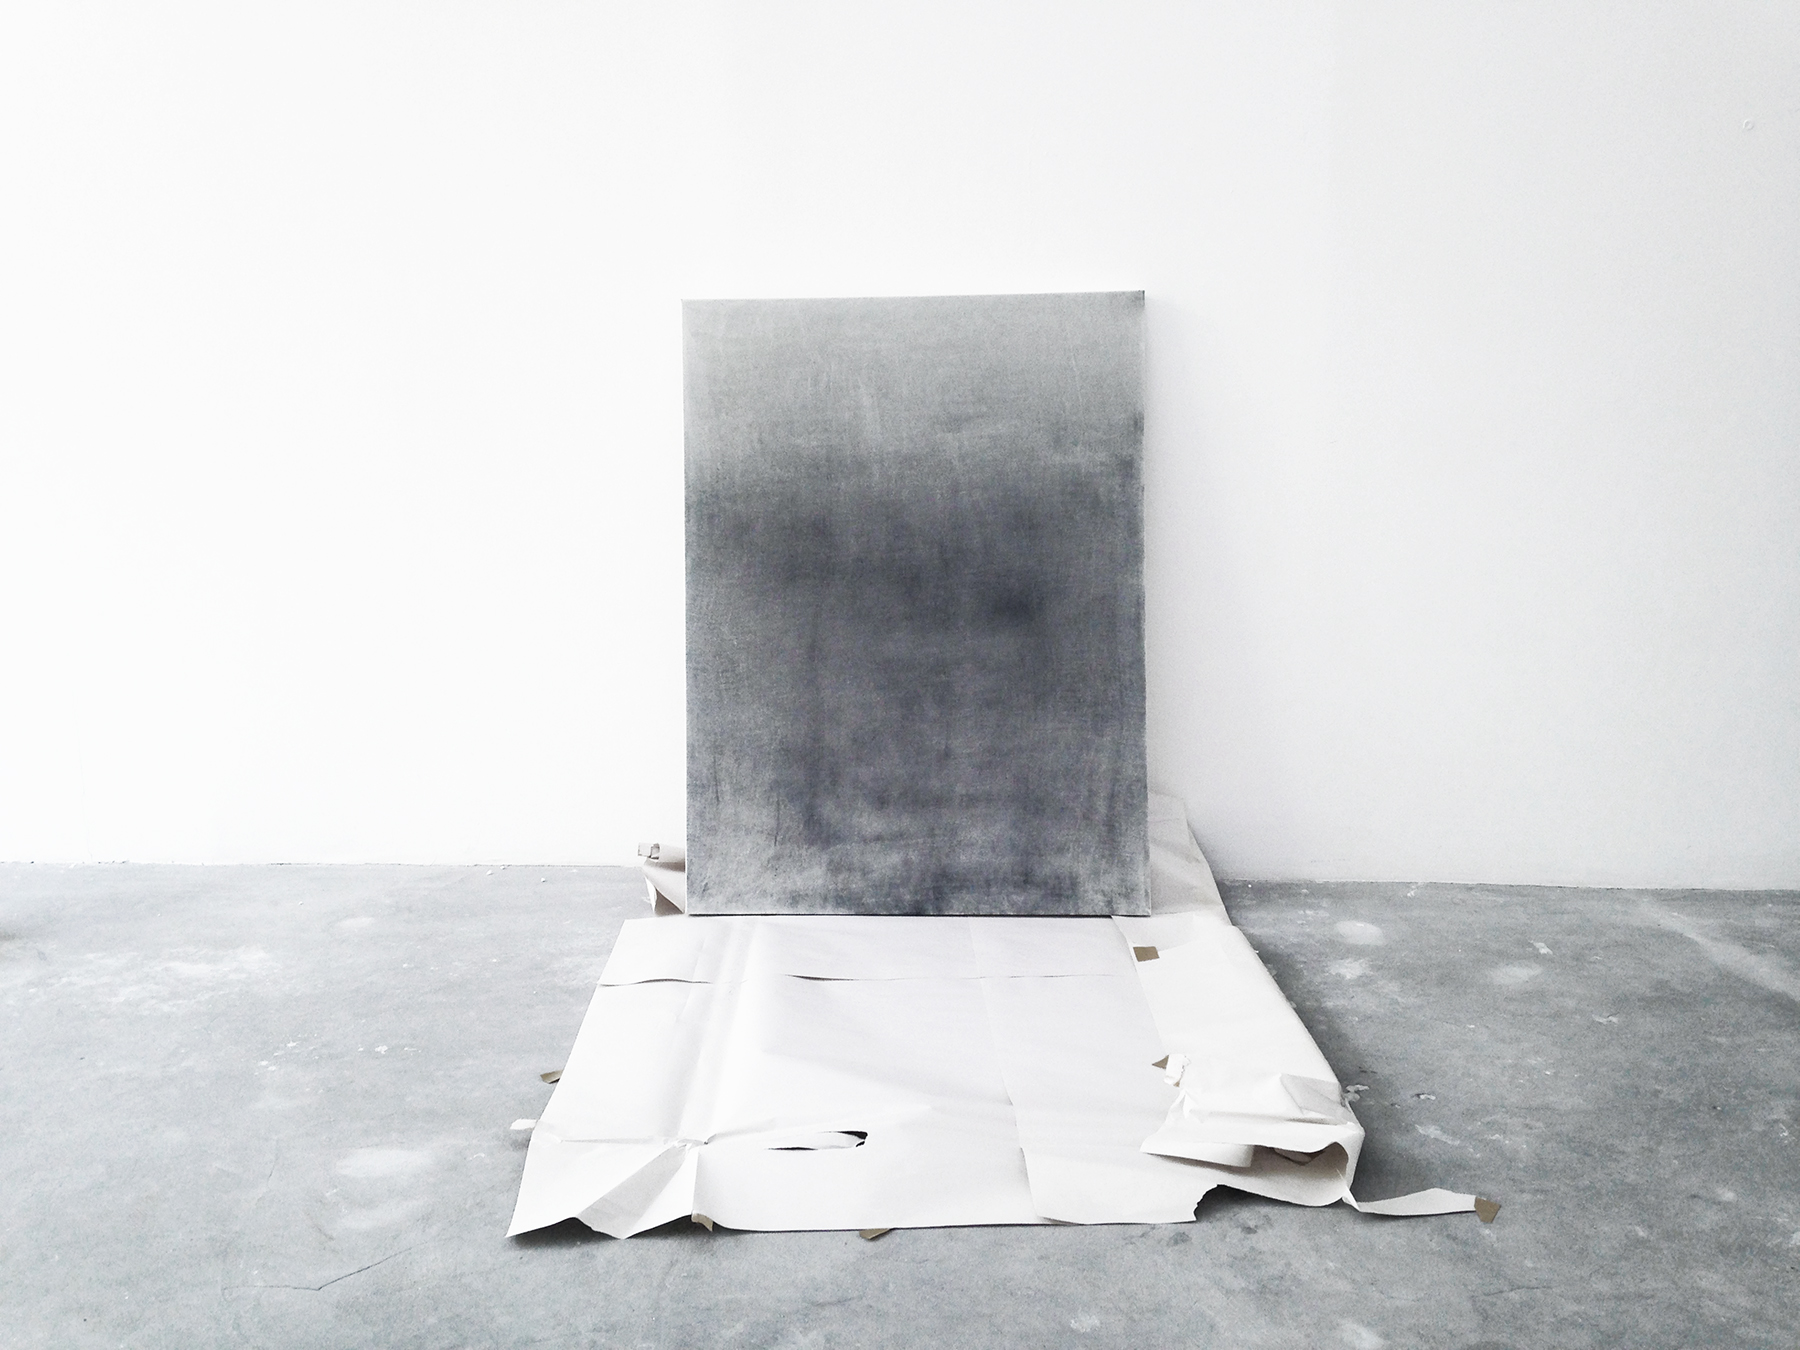 alessandro moroder   dirt painting   dirt, enamel on canvas  120 x 80 cms  2015